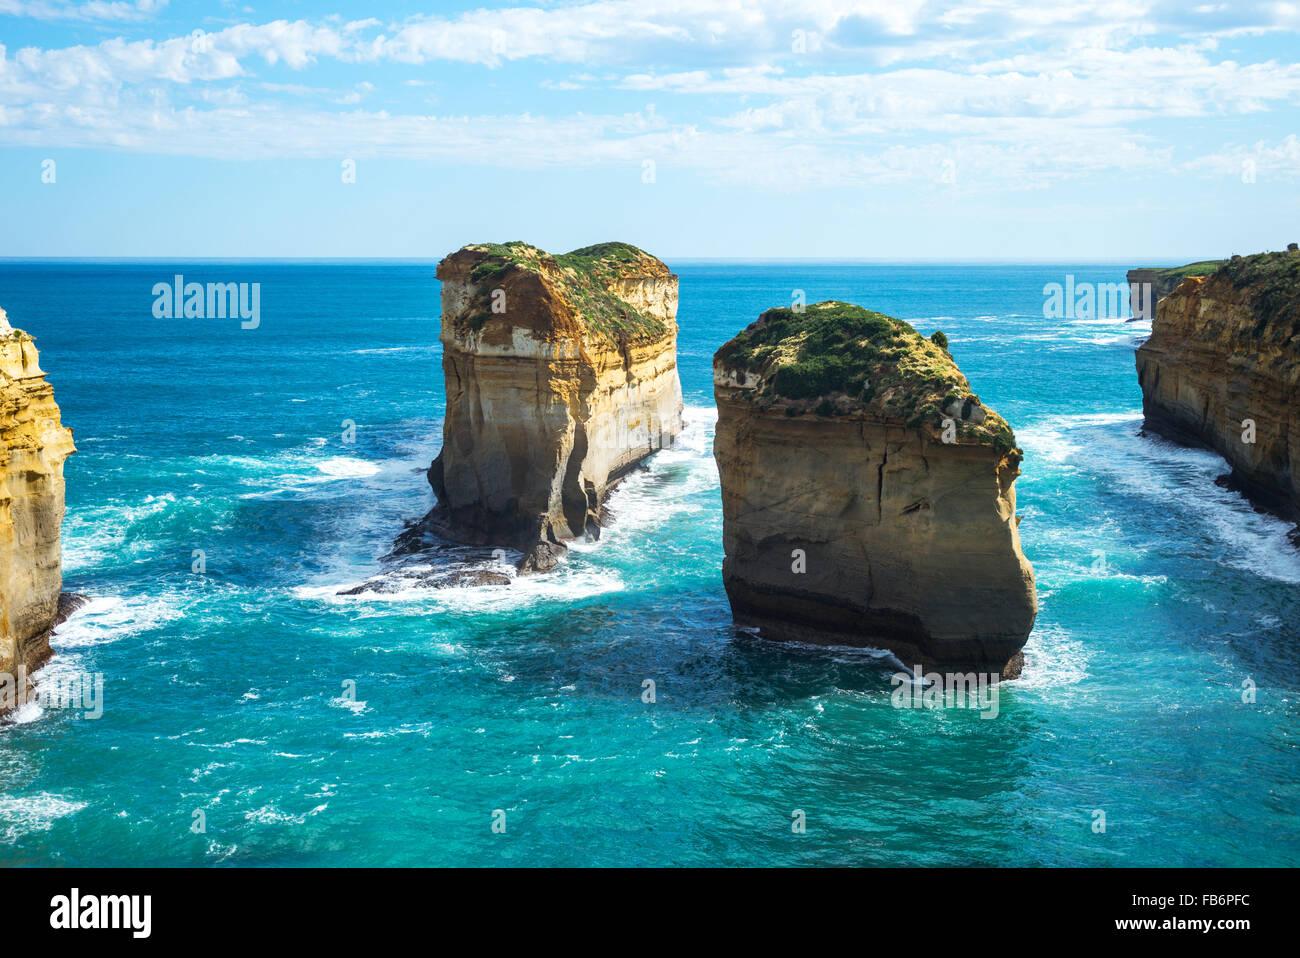 Australien, Port Campbell, die zwölf Apostel Meerespark Stockbild